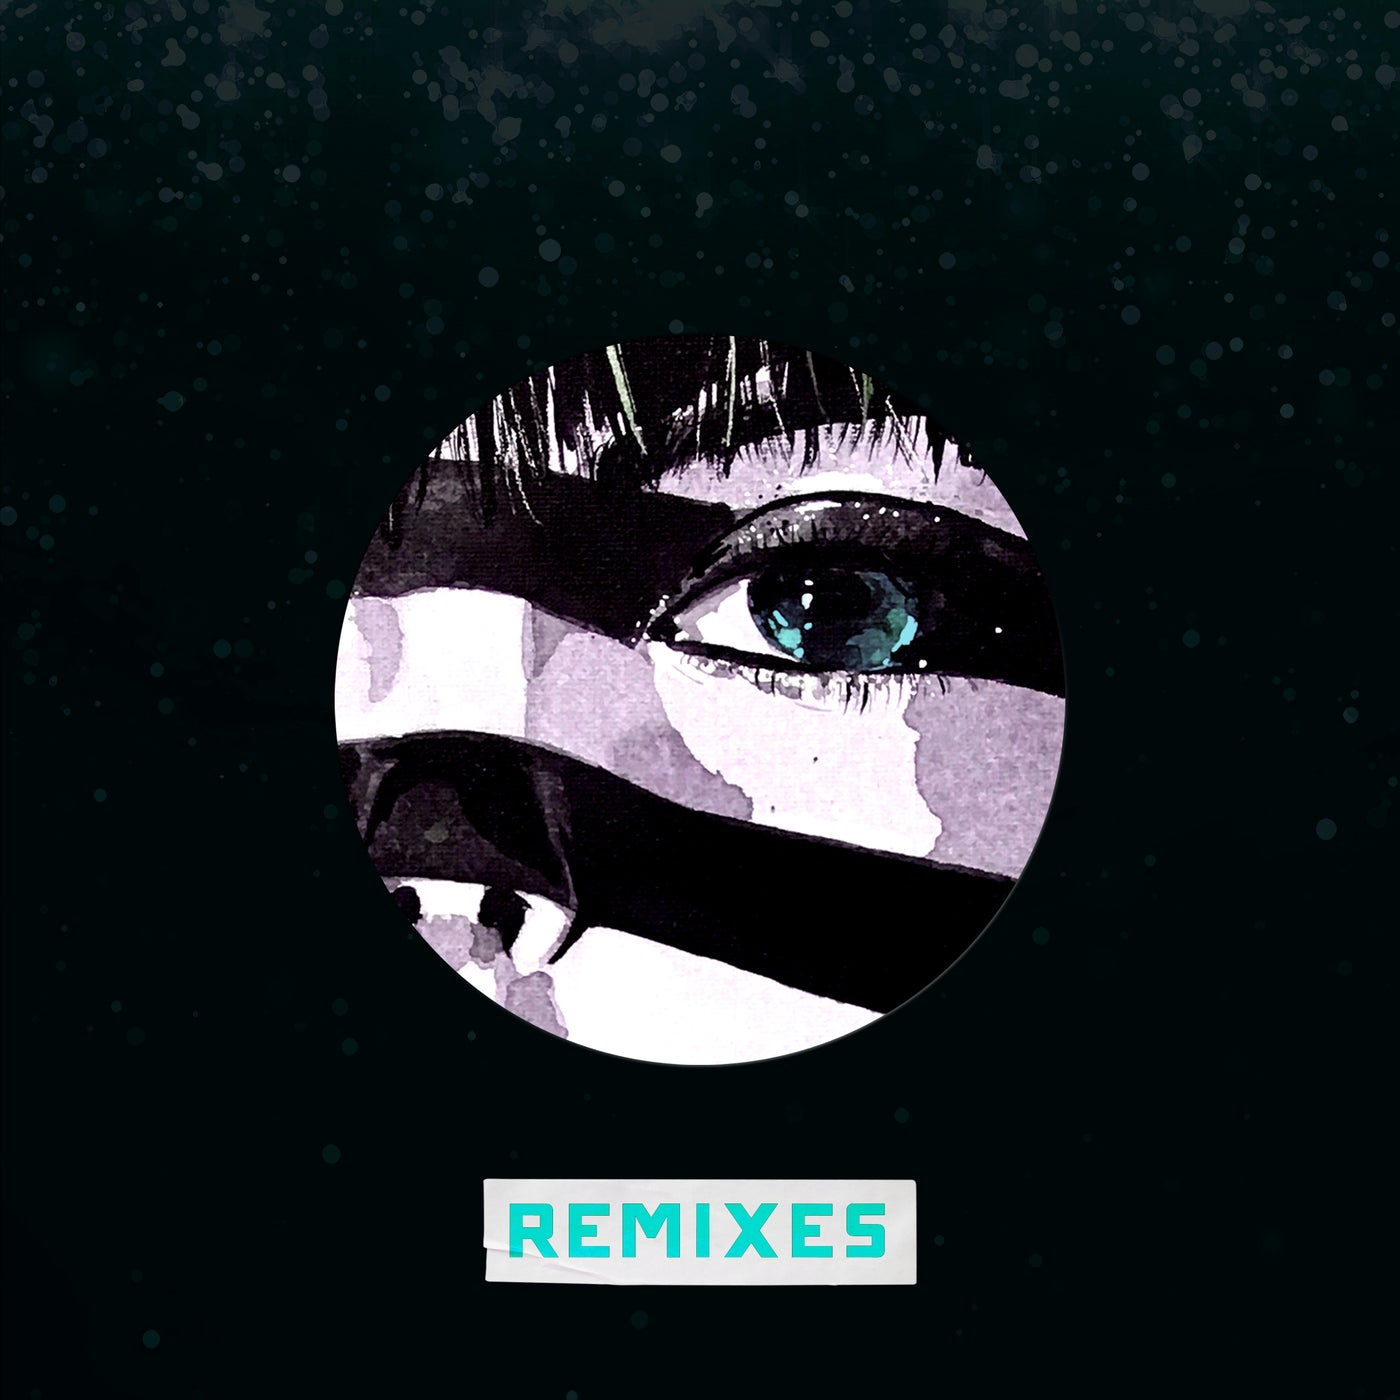 Fireworks Feat. Moss Kena & The Knocks (Breakbot & Irfane Remix)